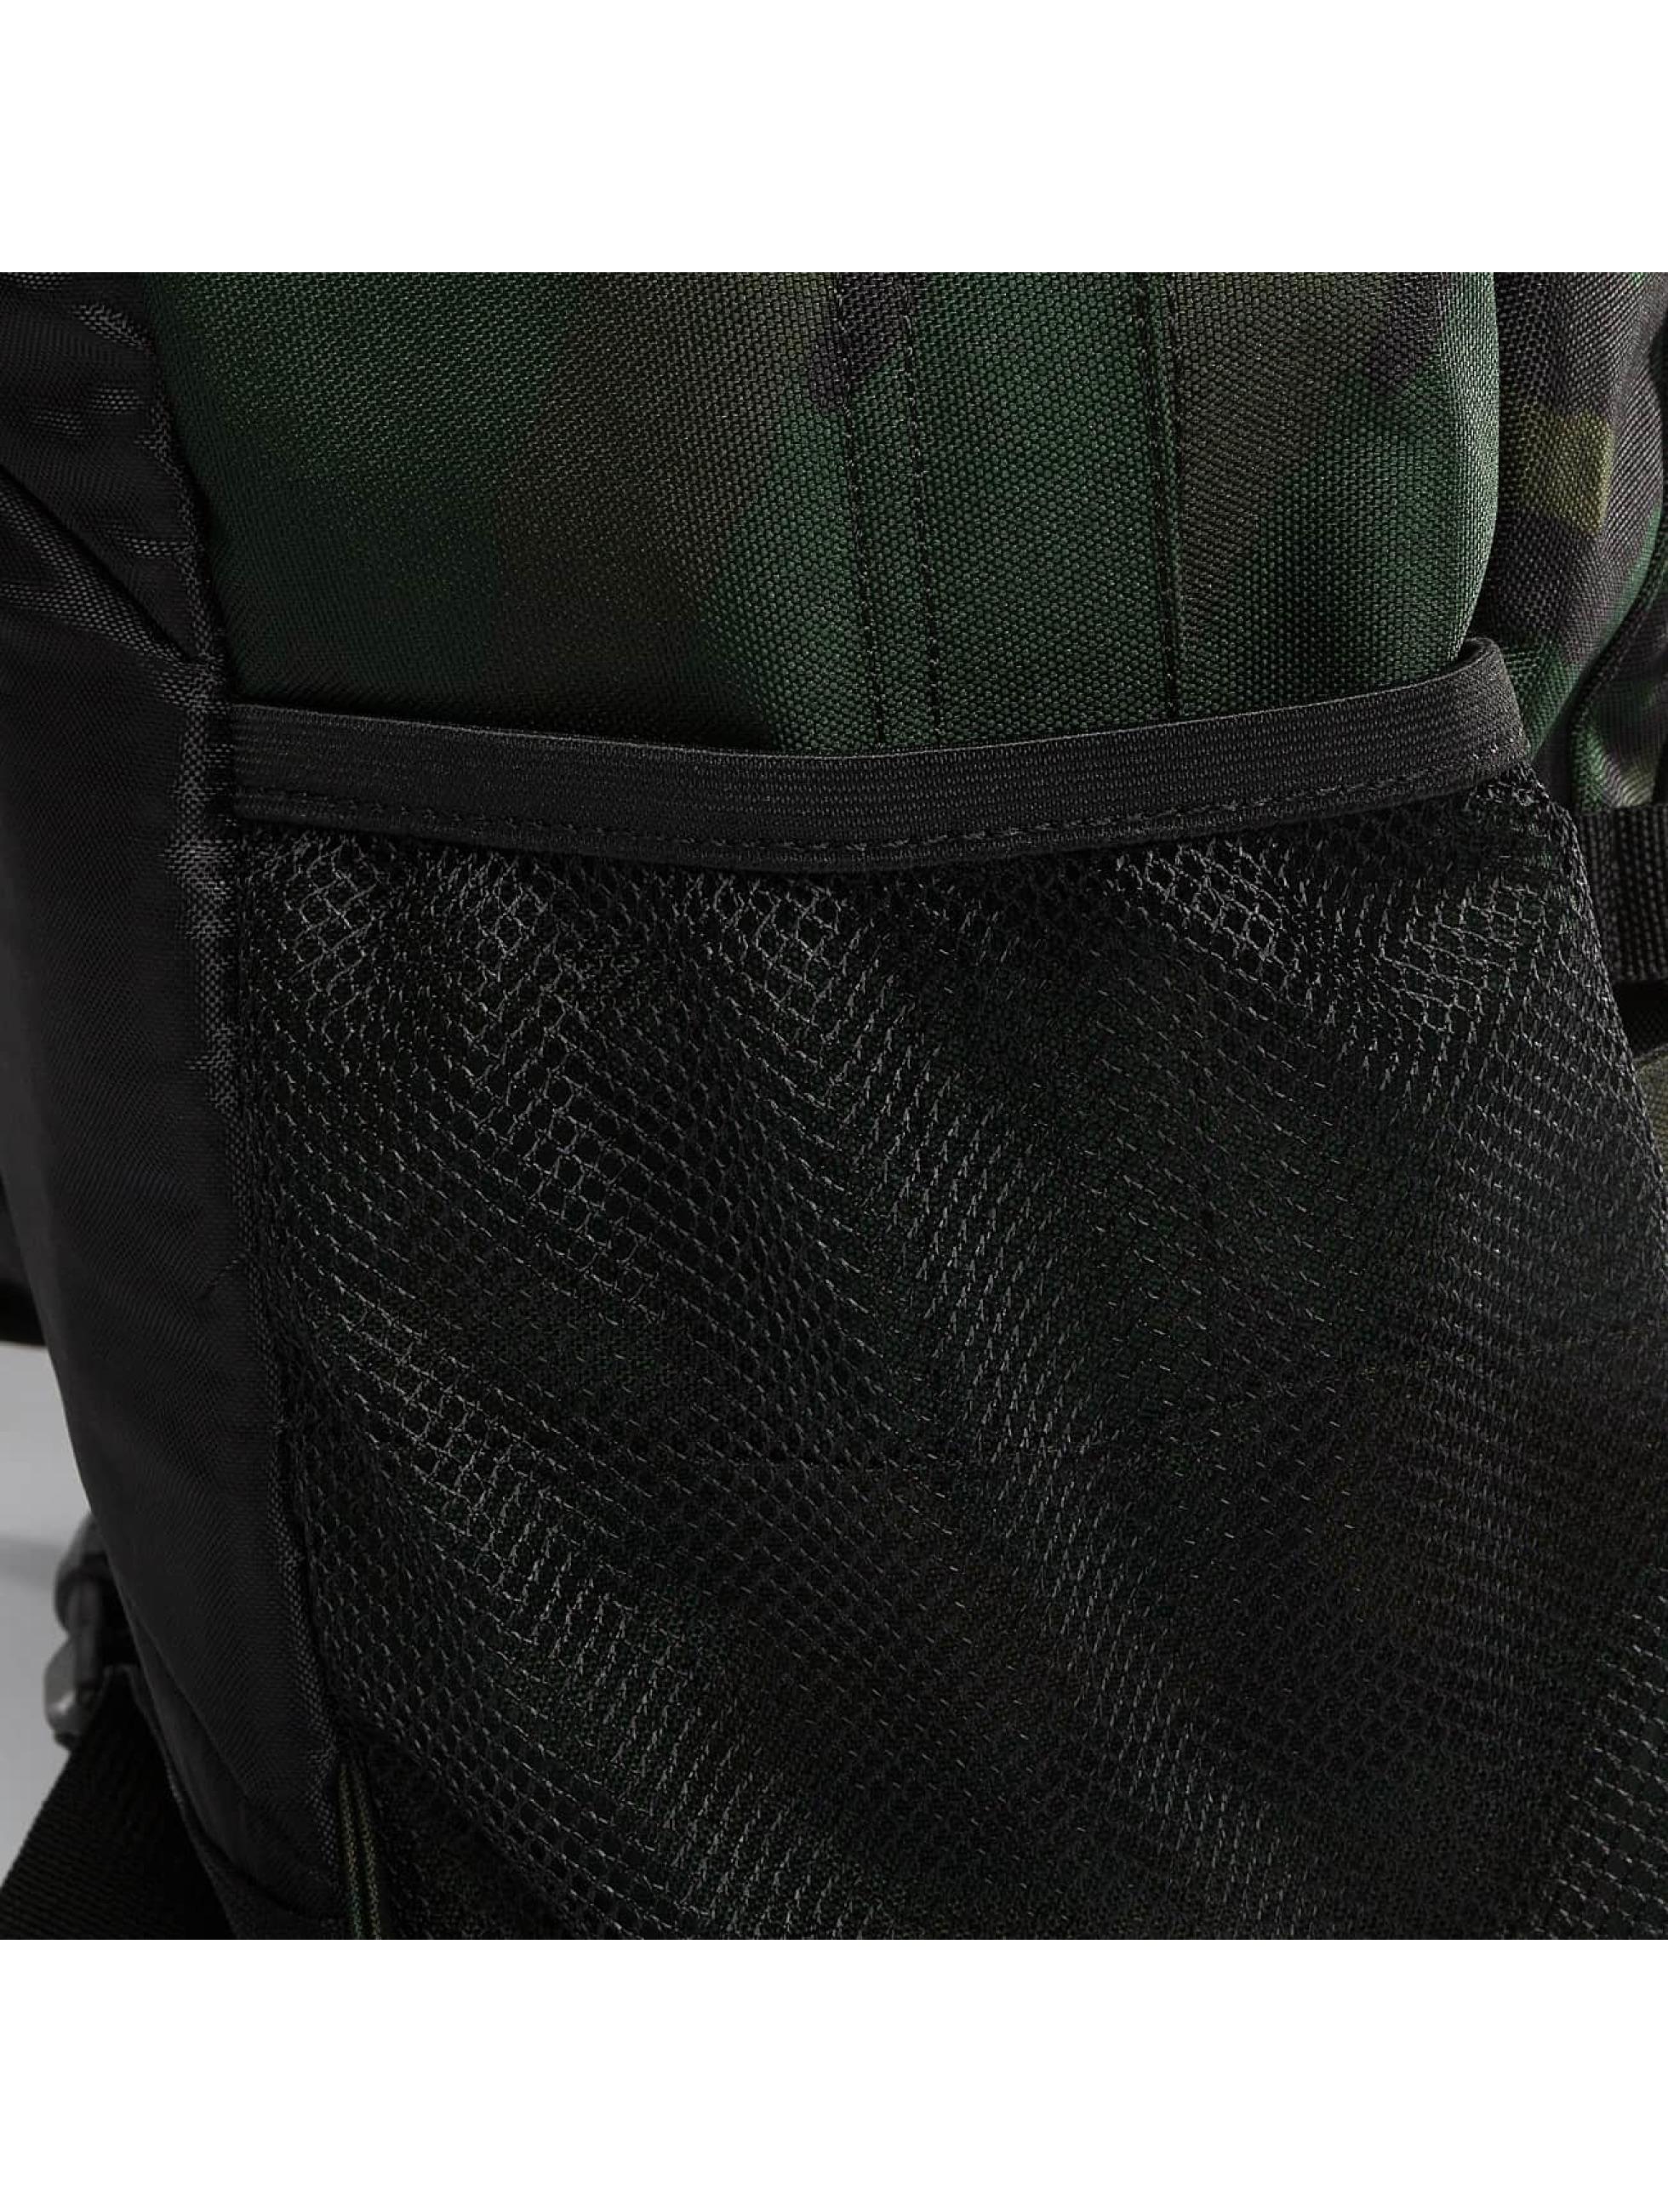 Carhartt WIP Backpack Kickflip camouflage